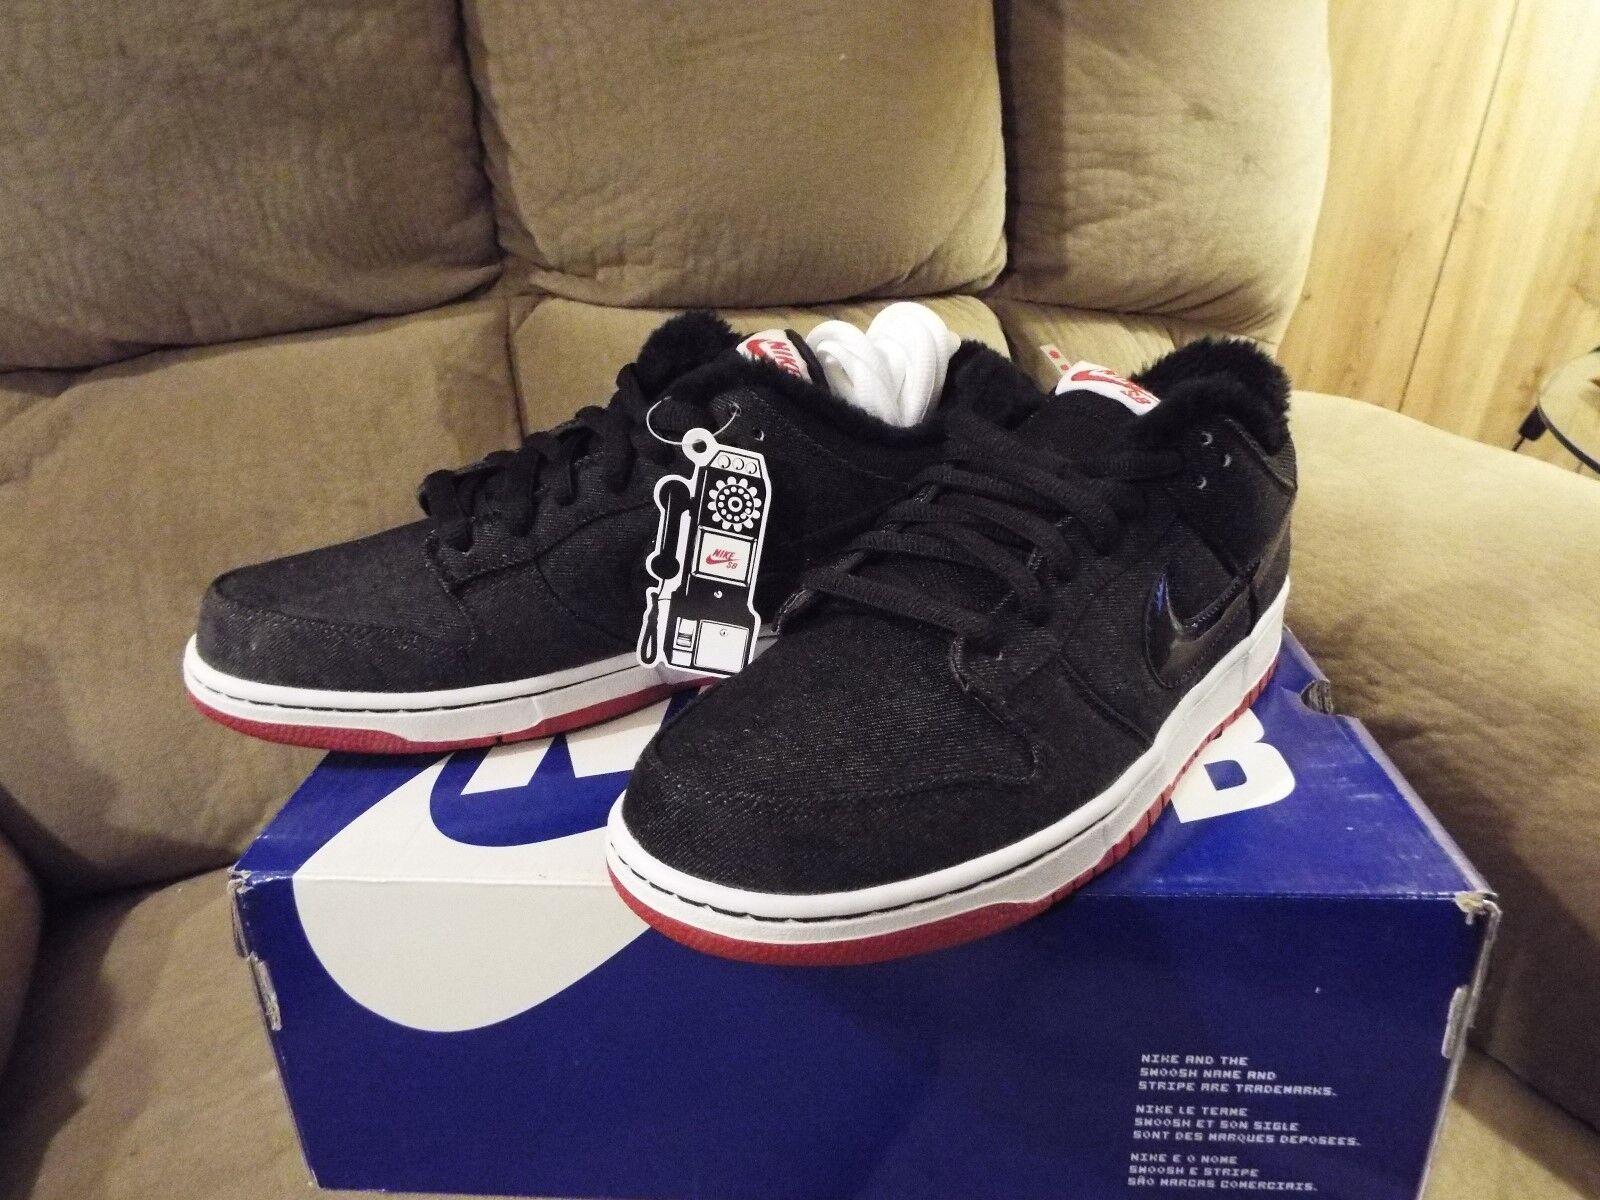 Nike Dunk Low Premium SB - 10.5  Larry Perkins  NEW W BOX XTRA LACES DEADSTOCK